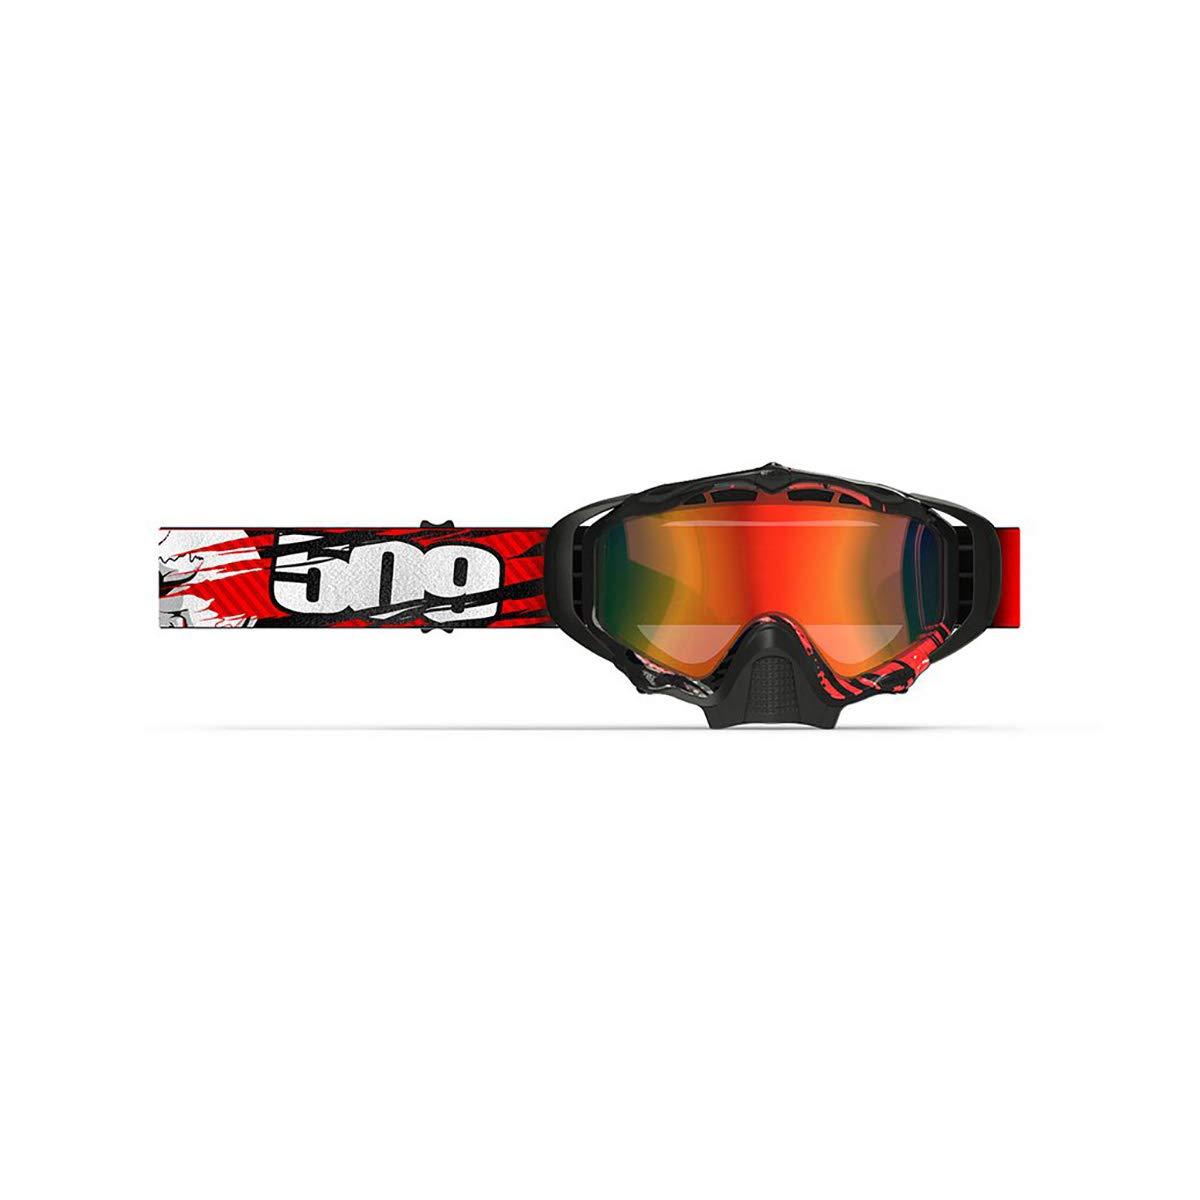 1ee303000b8e Amazon.com  509 Sinister X5 Snowmobile Goggle (Orange)  Automotive